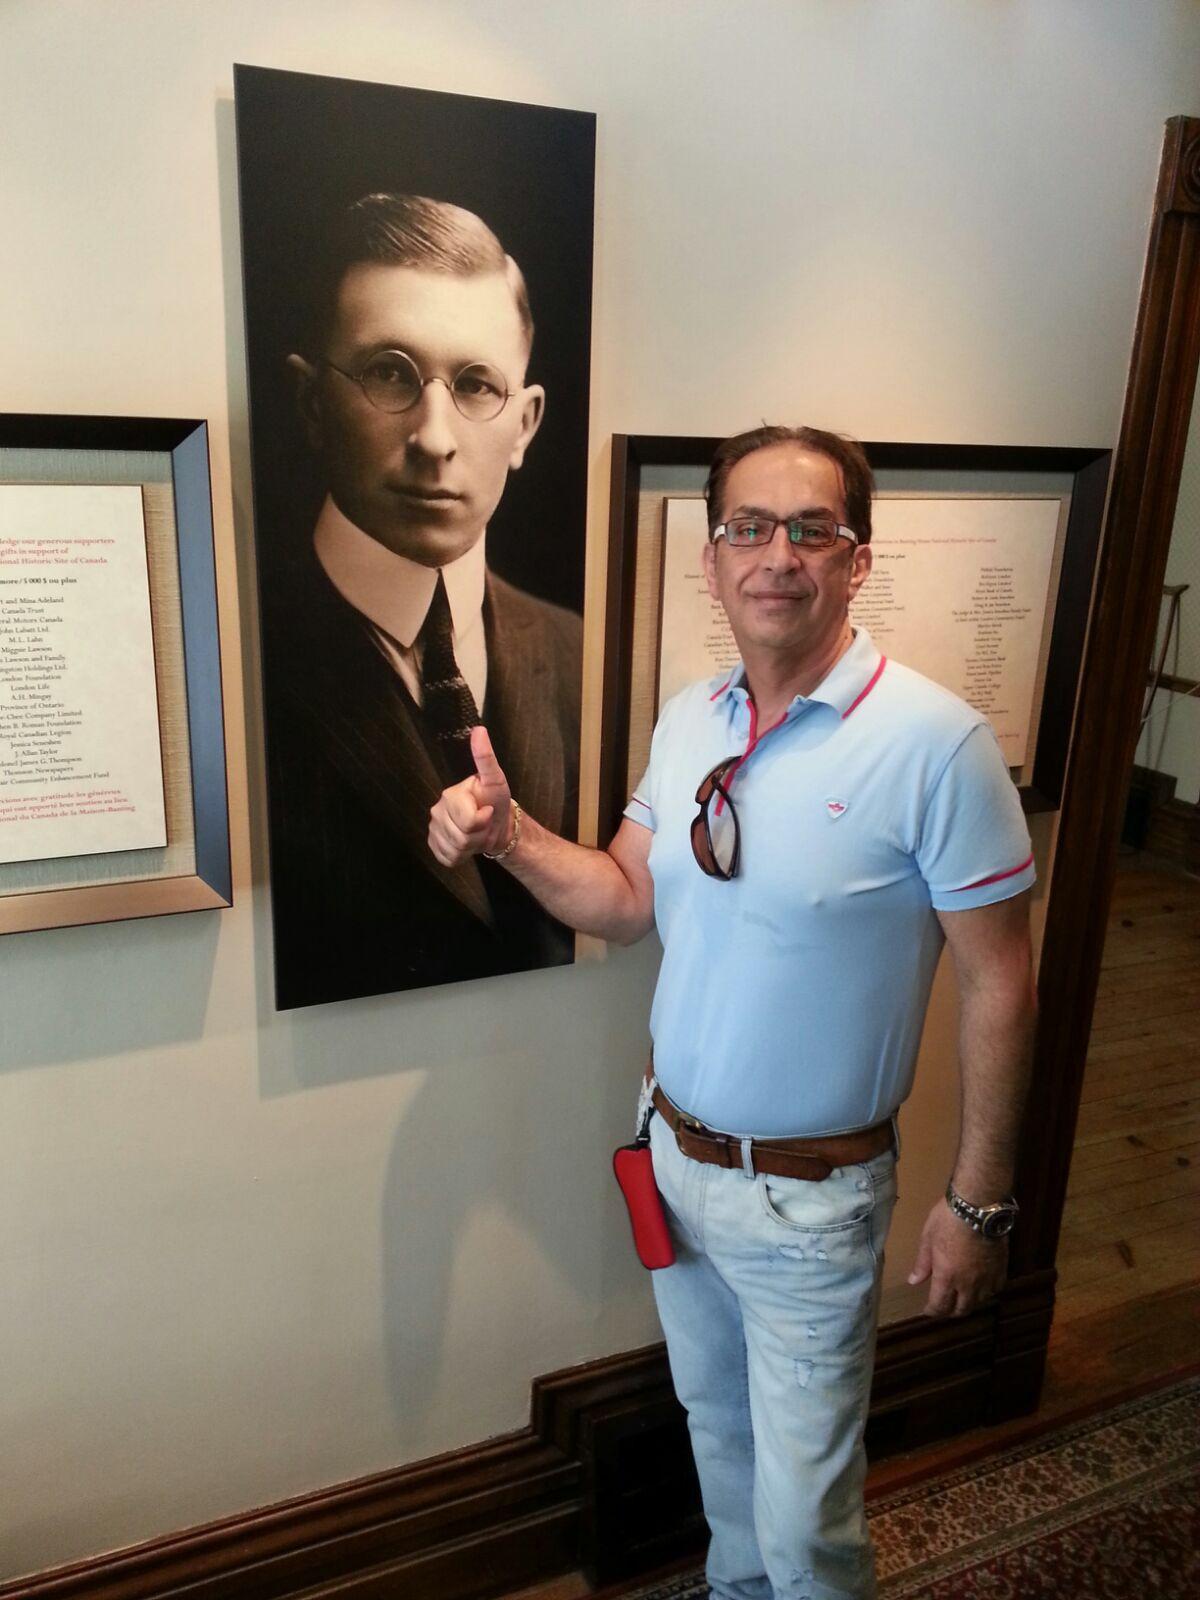 Dr fares boufakhreddine near the portrait of frederick